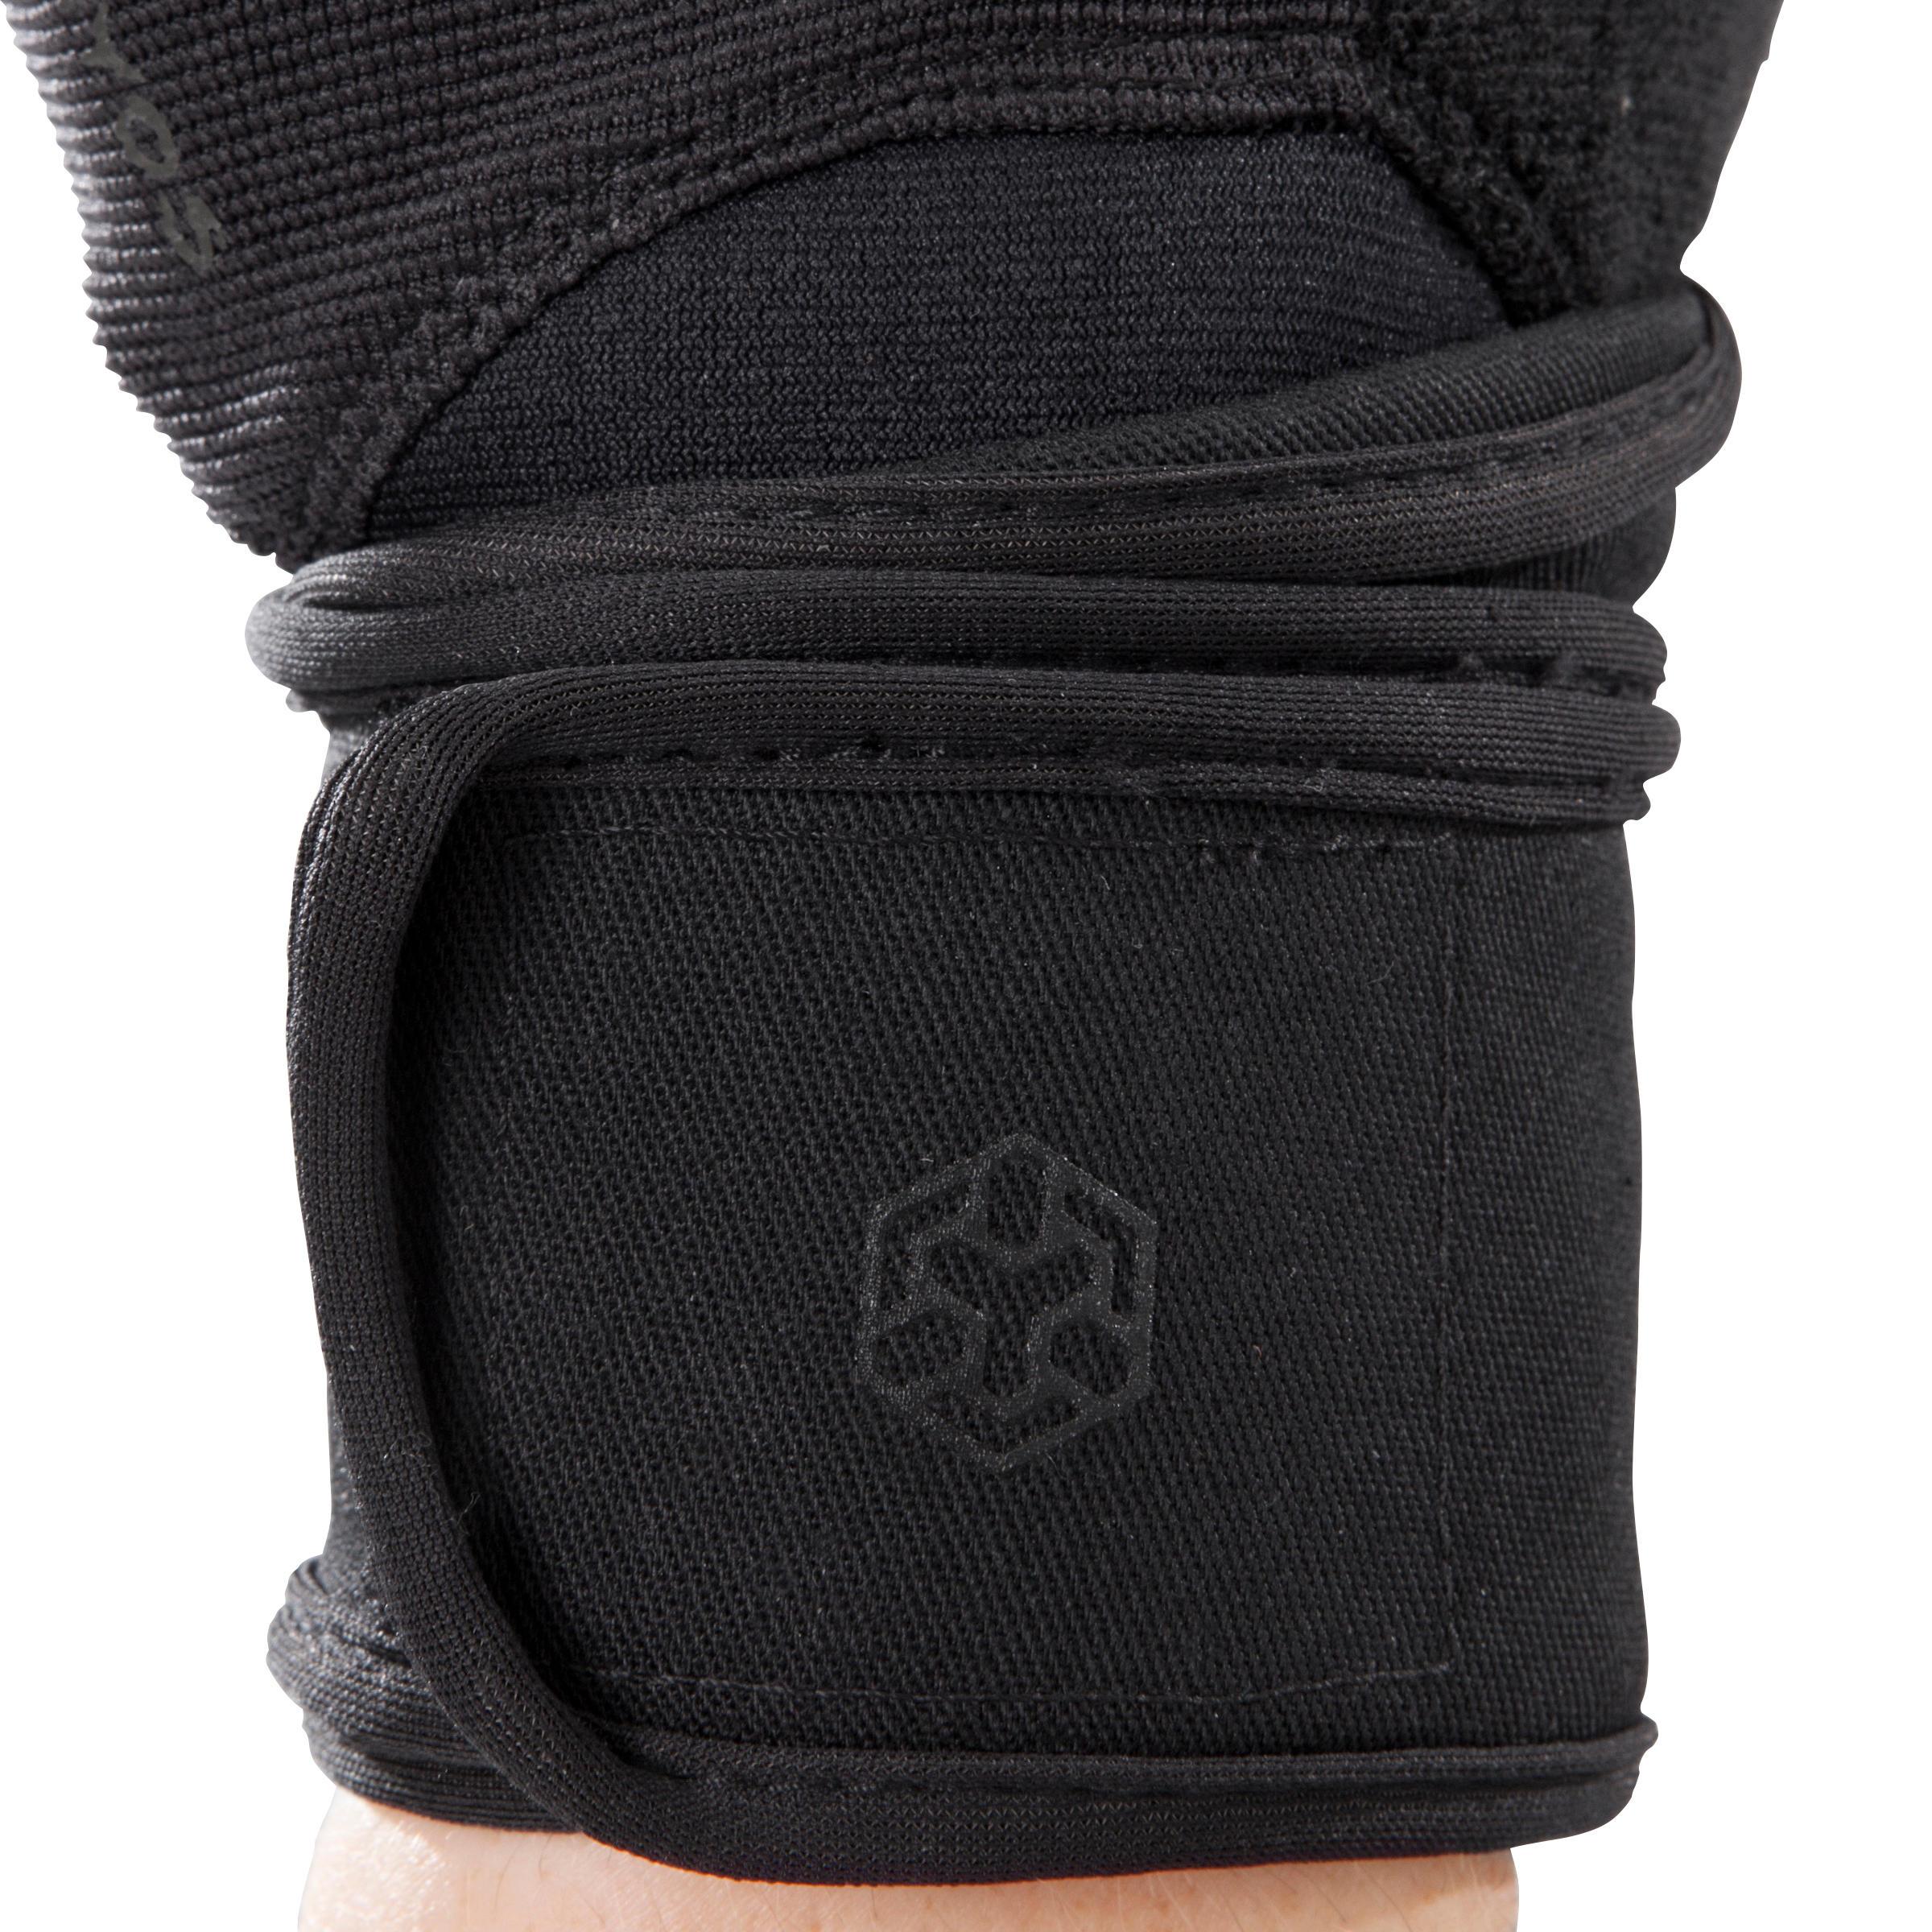 Black//Grey DOMYOS 900 Weight Training Glove with Double Rip-Tab Cuff